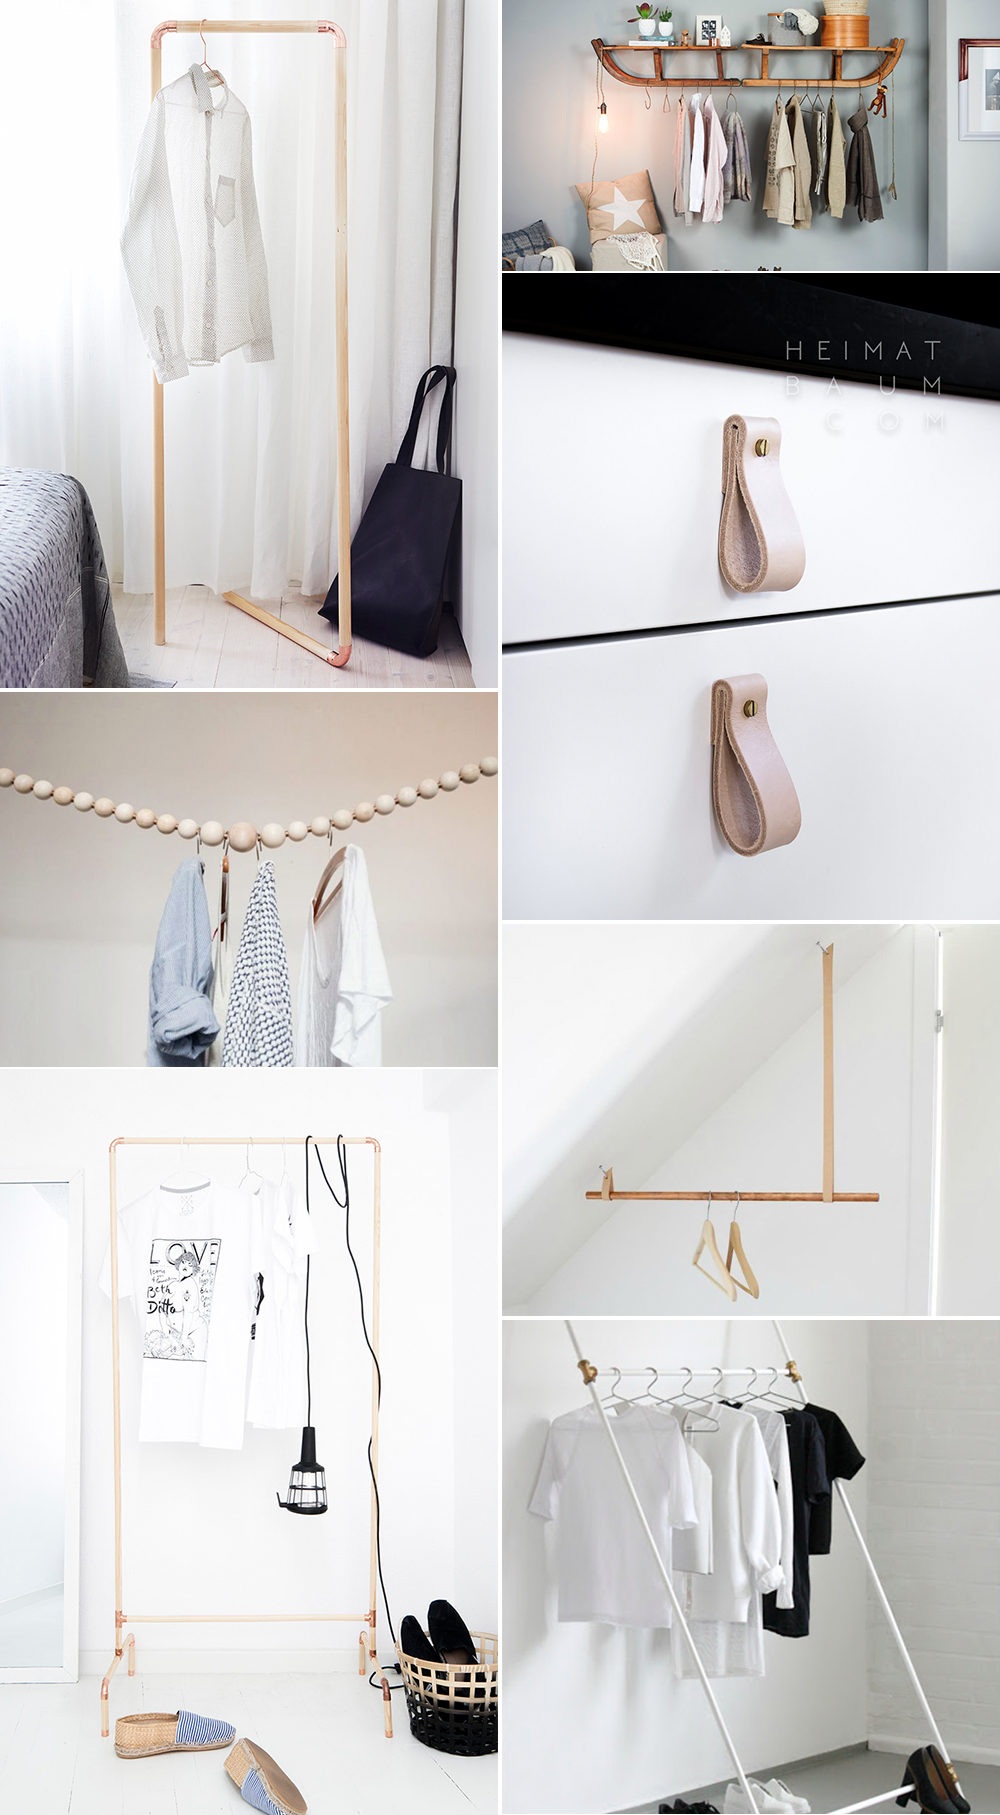 Diy Garderobe | We Love Inspiration Diys Fur Die Garderobe We Love Handmade